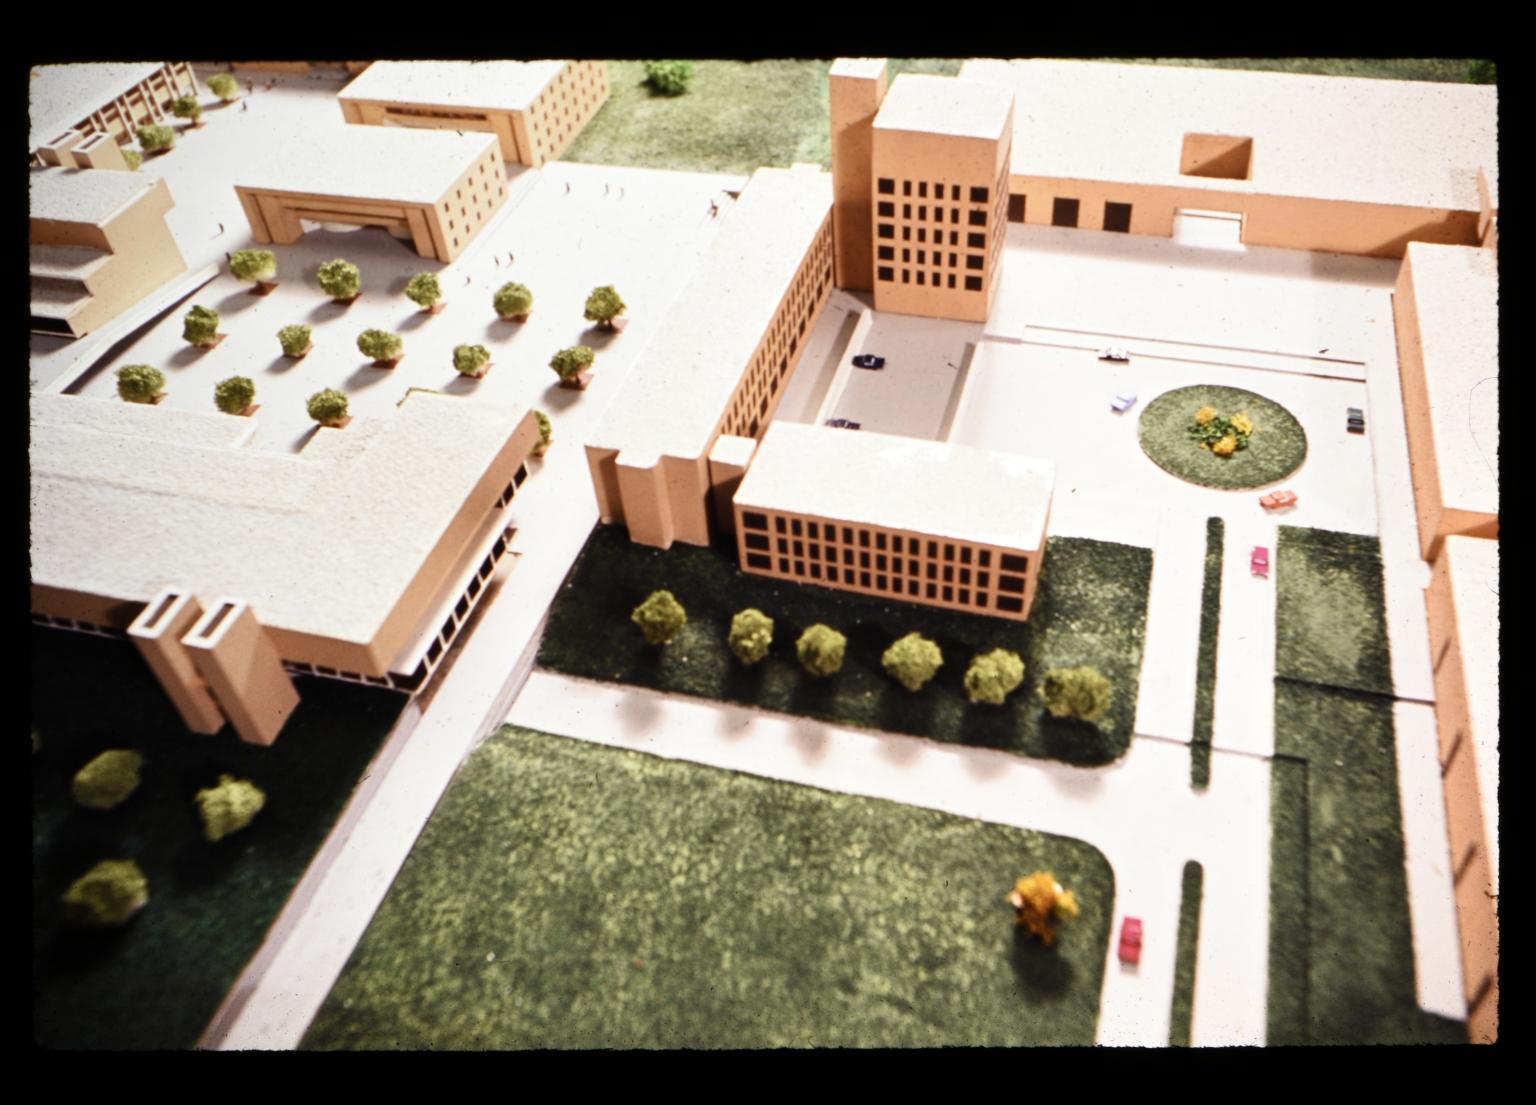 3-D model of proposed RIT campus